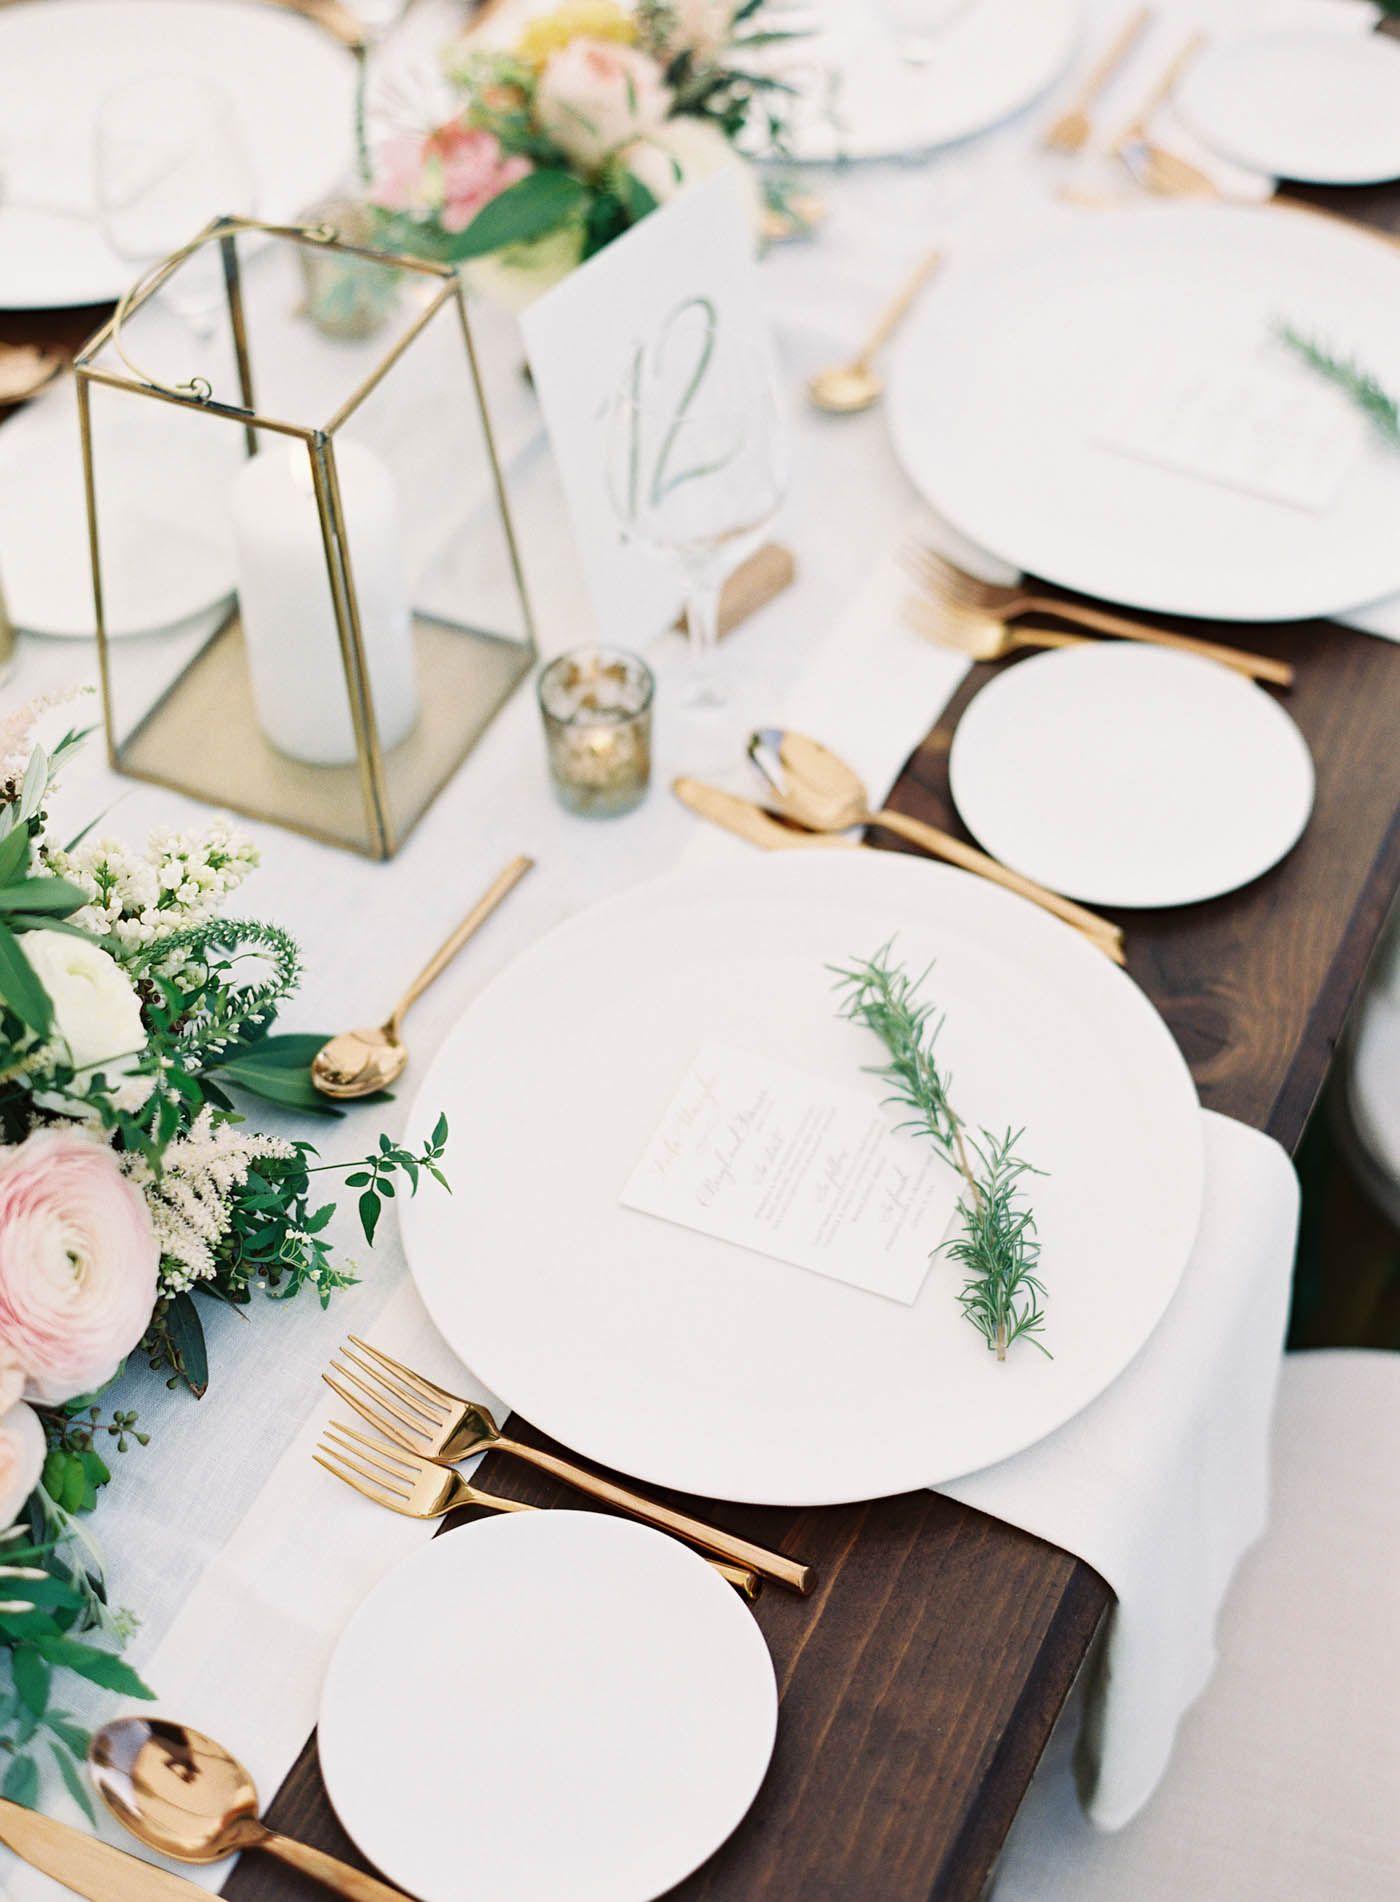 Ojai Valley Inn Spring Wedding   Twig & Twine   All You Need is Love ...